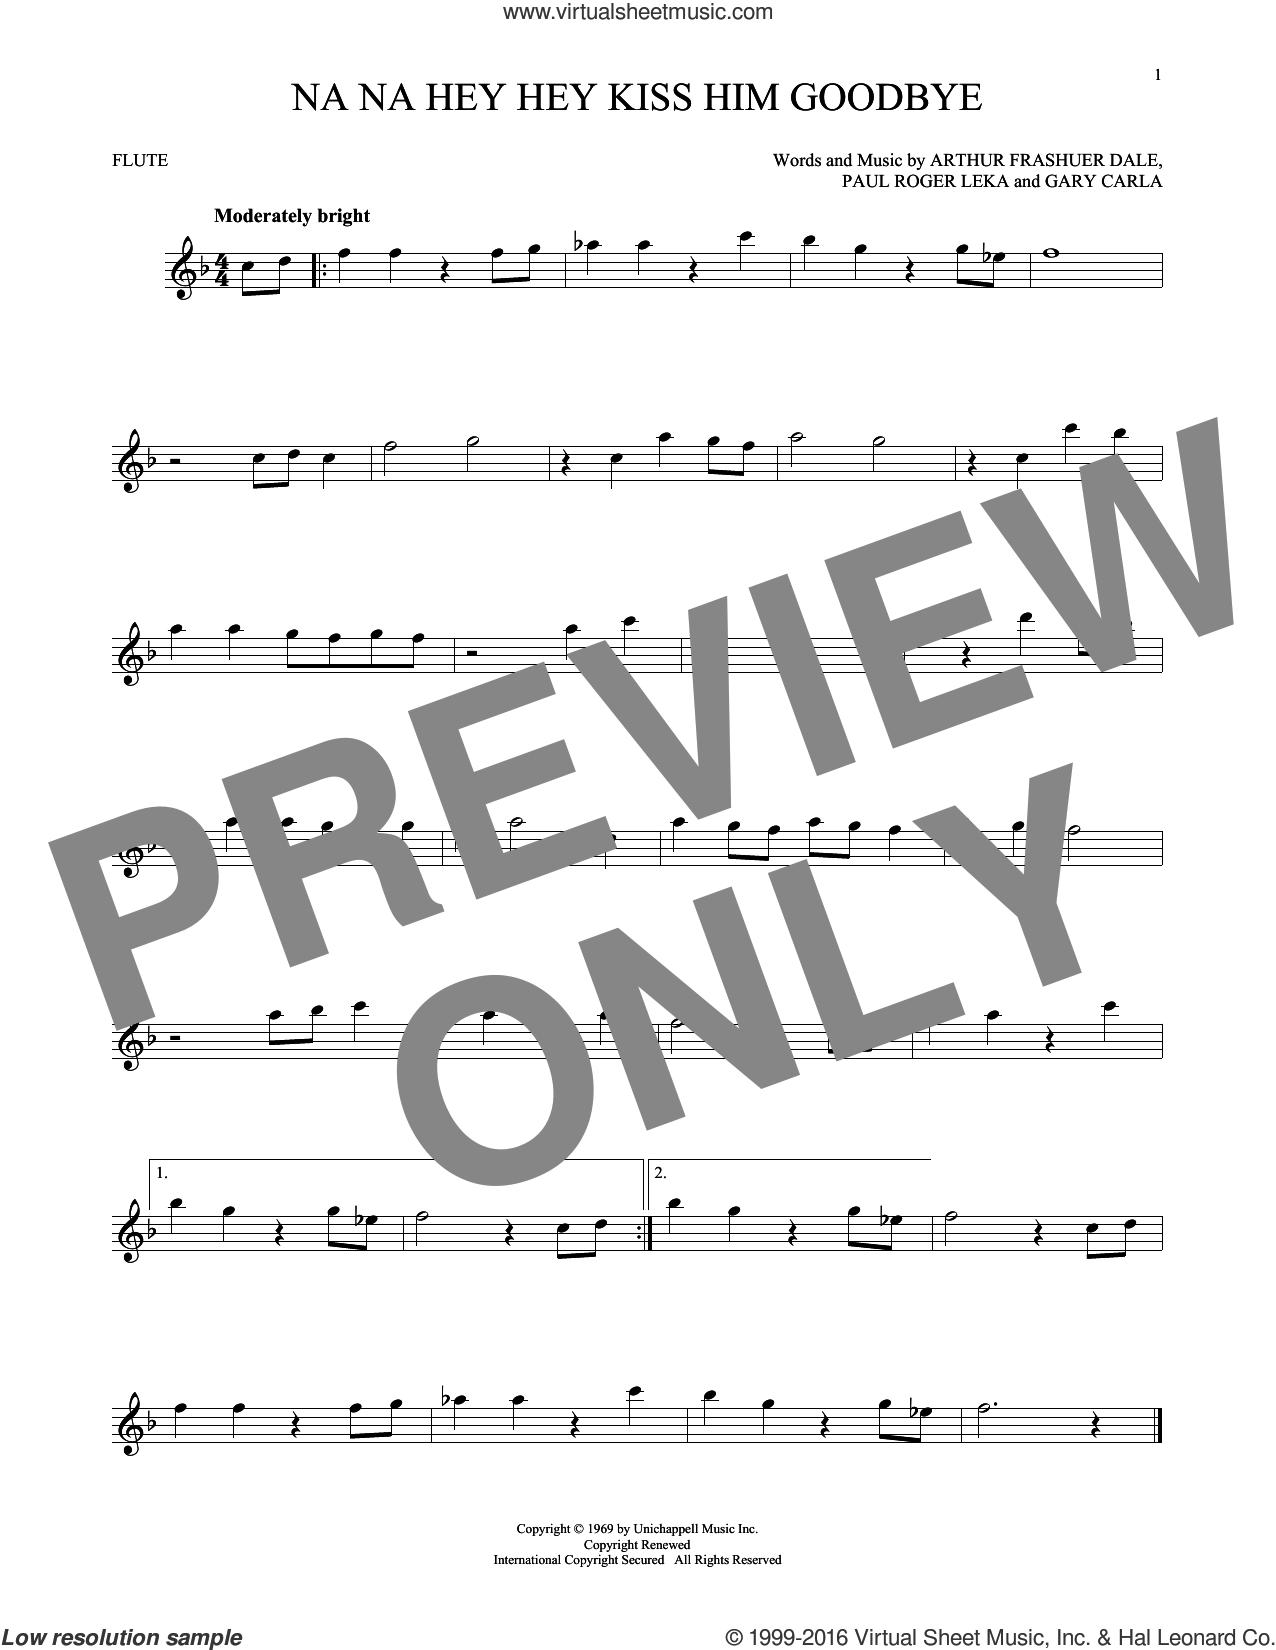 Na Na Hey Hey Kiss Him Goodbye sheet music for flute solo by Steam, Dale Frashuer, Gary De Carlo and Paul Leka, intermediate skill level